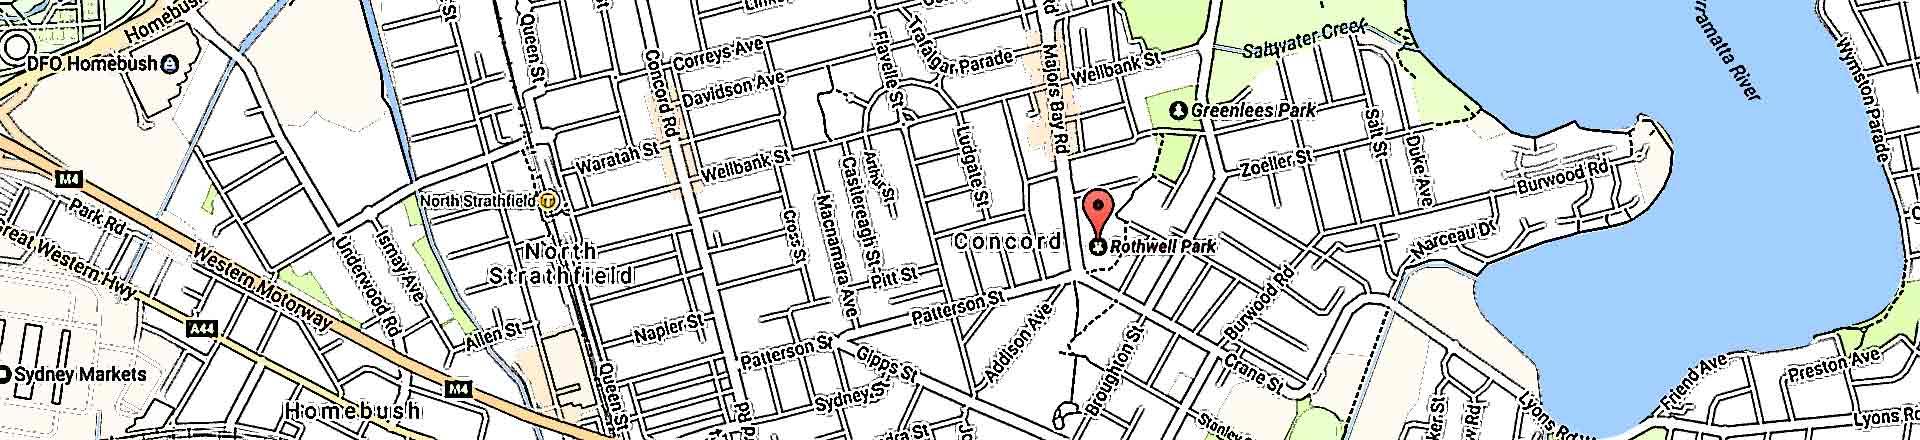 Map of Briars Home Ground Rothwell